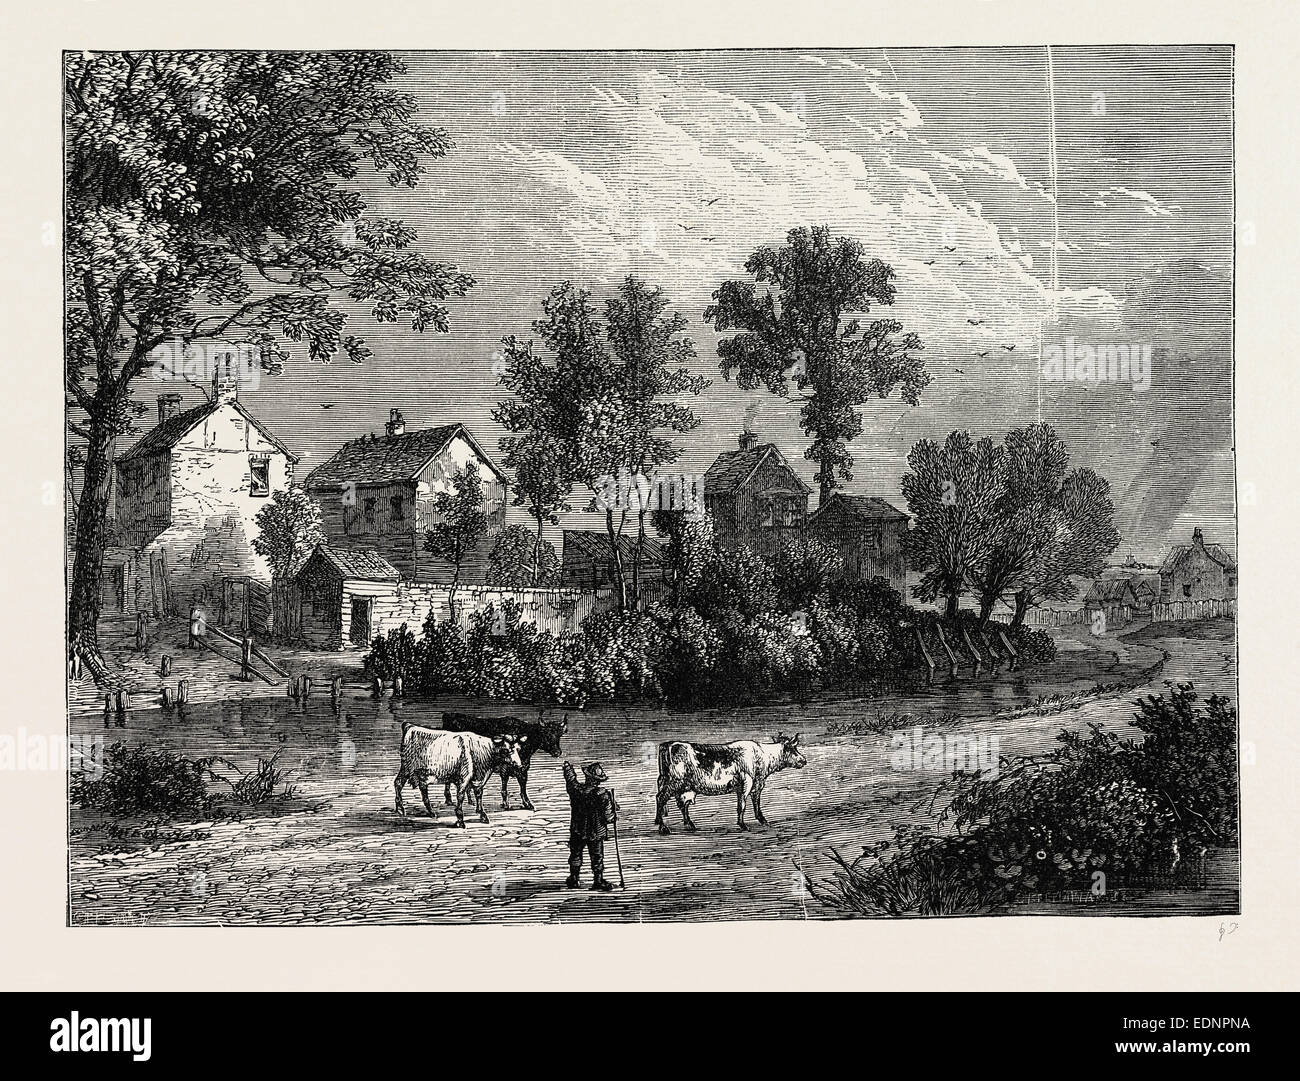 FARM IN THE REGENT'S PARK, 1750. London, UK, 19th century engraving Stock Photo